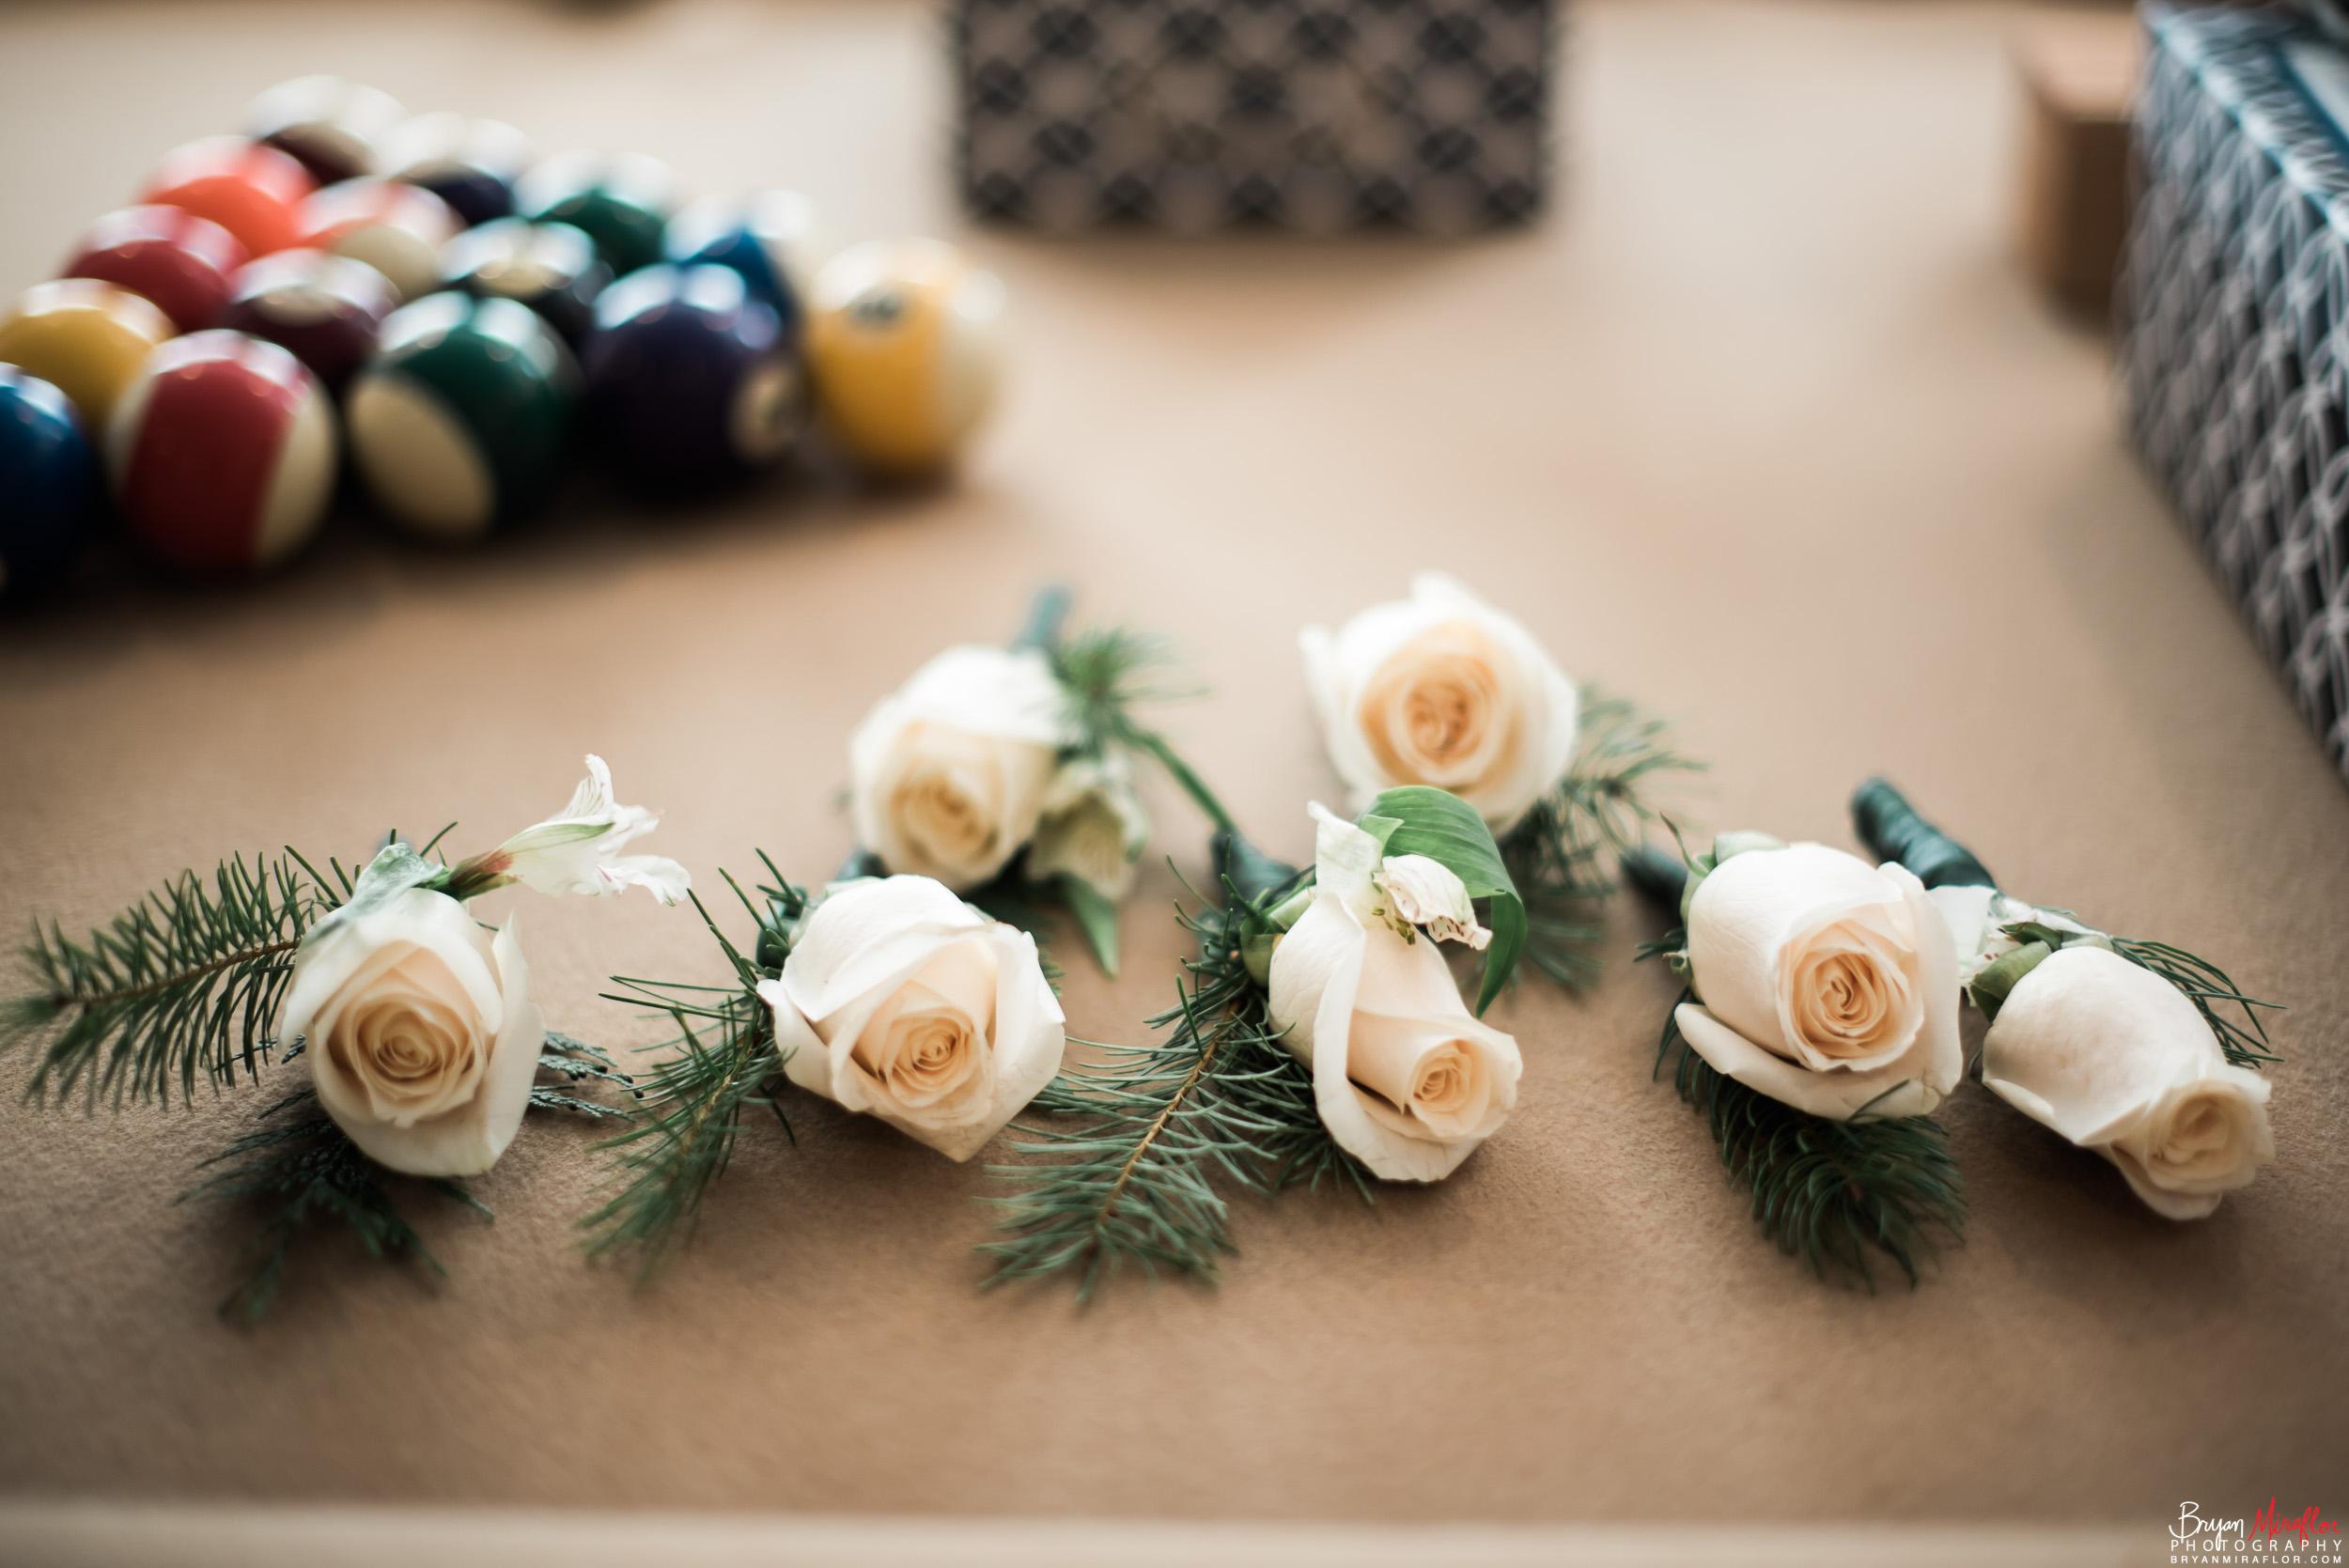 Bryan-Miraflor-Photography-Hannah-Jonathan-Married-Grand-Traditions-Estate-Gardens-Fallbrook-20171222-048.jpg